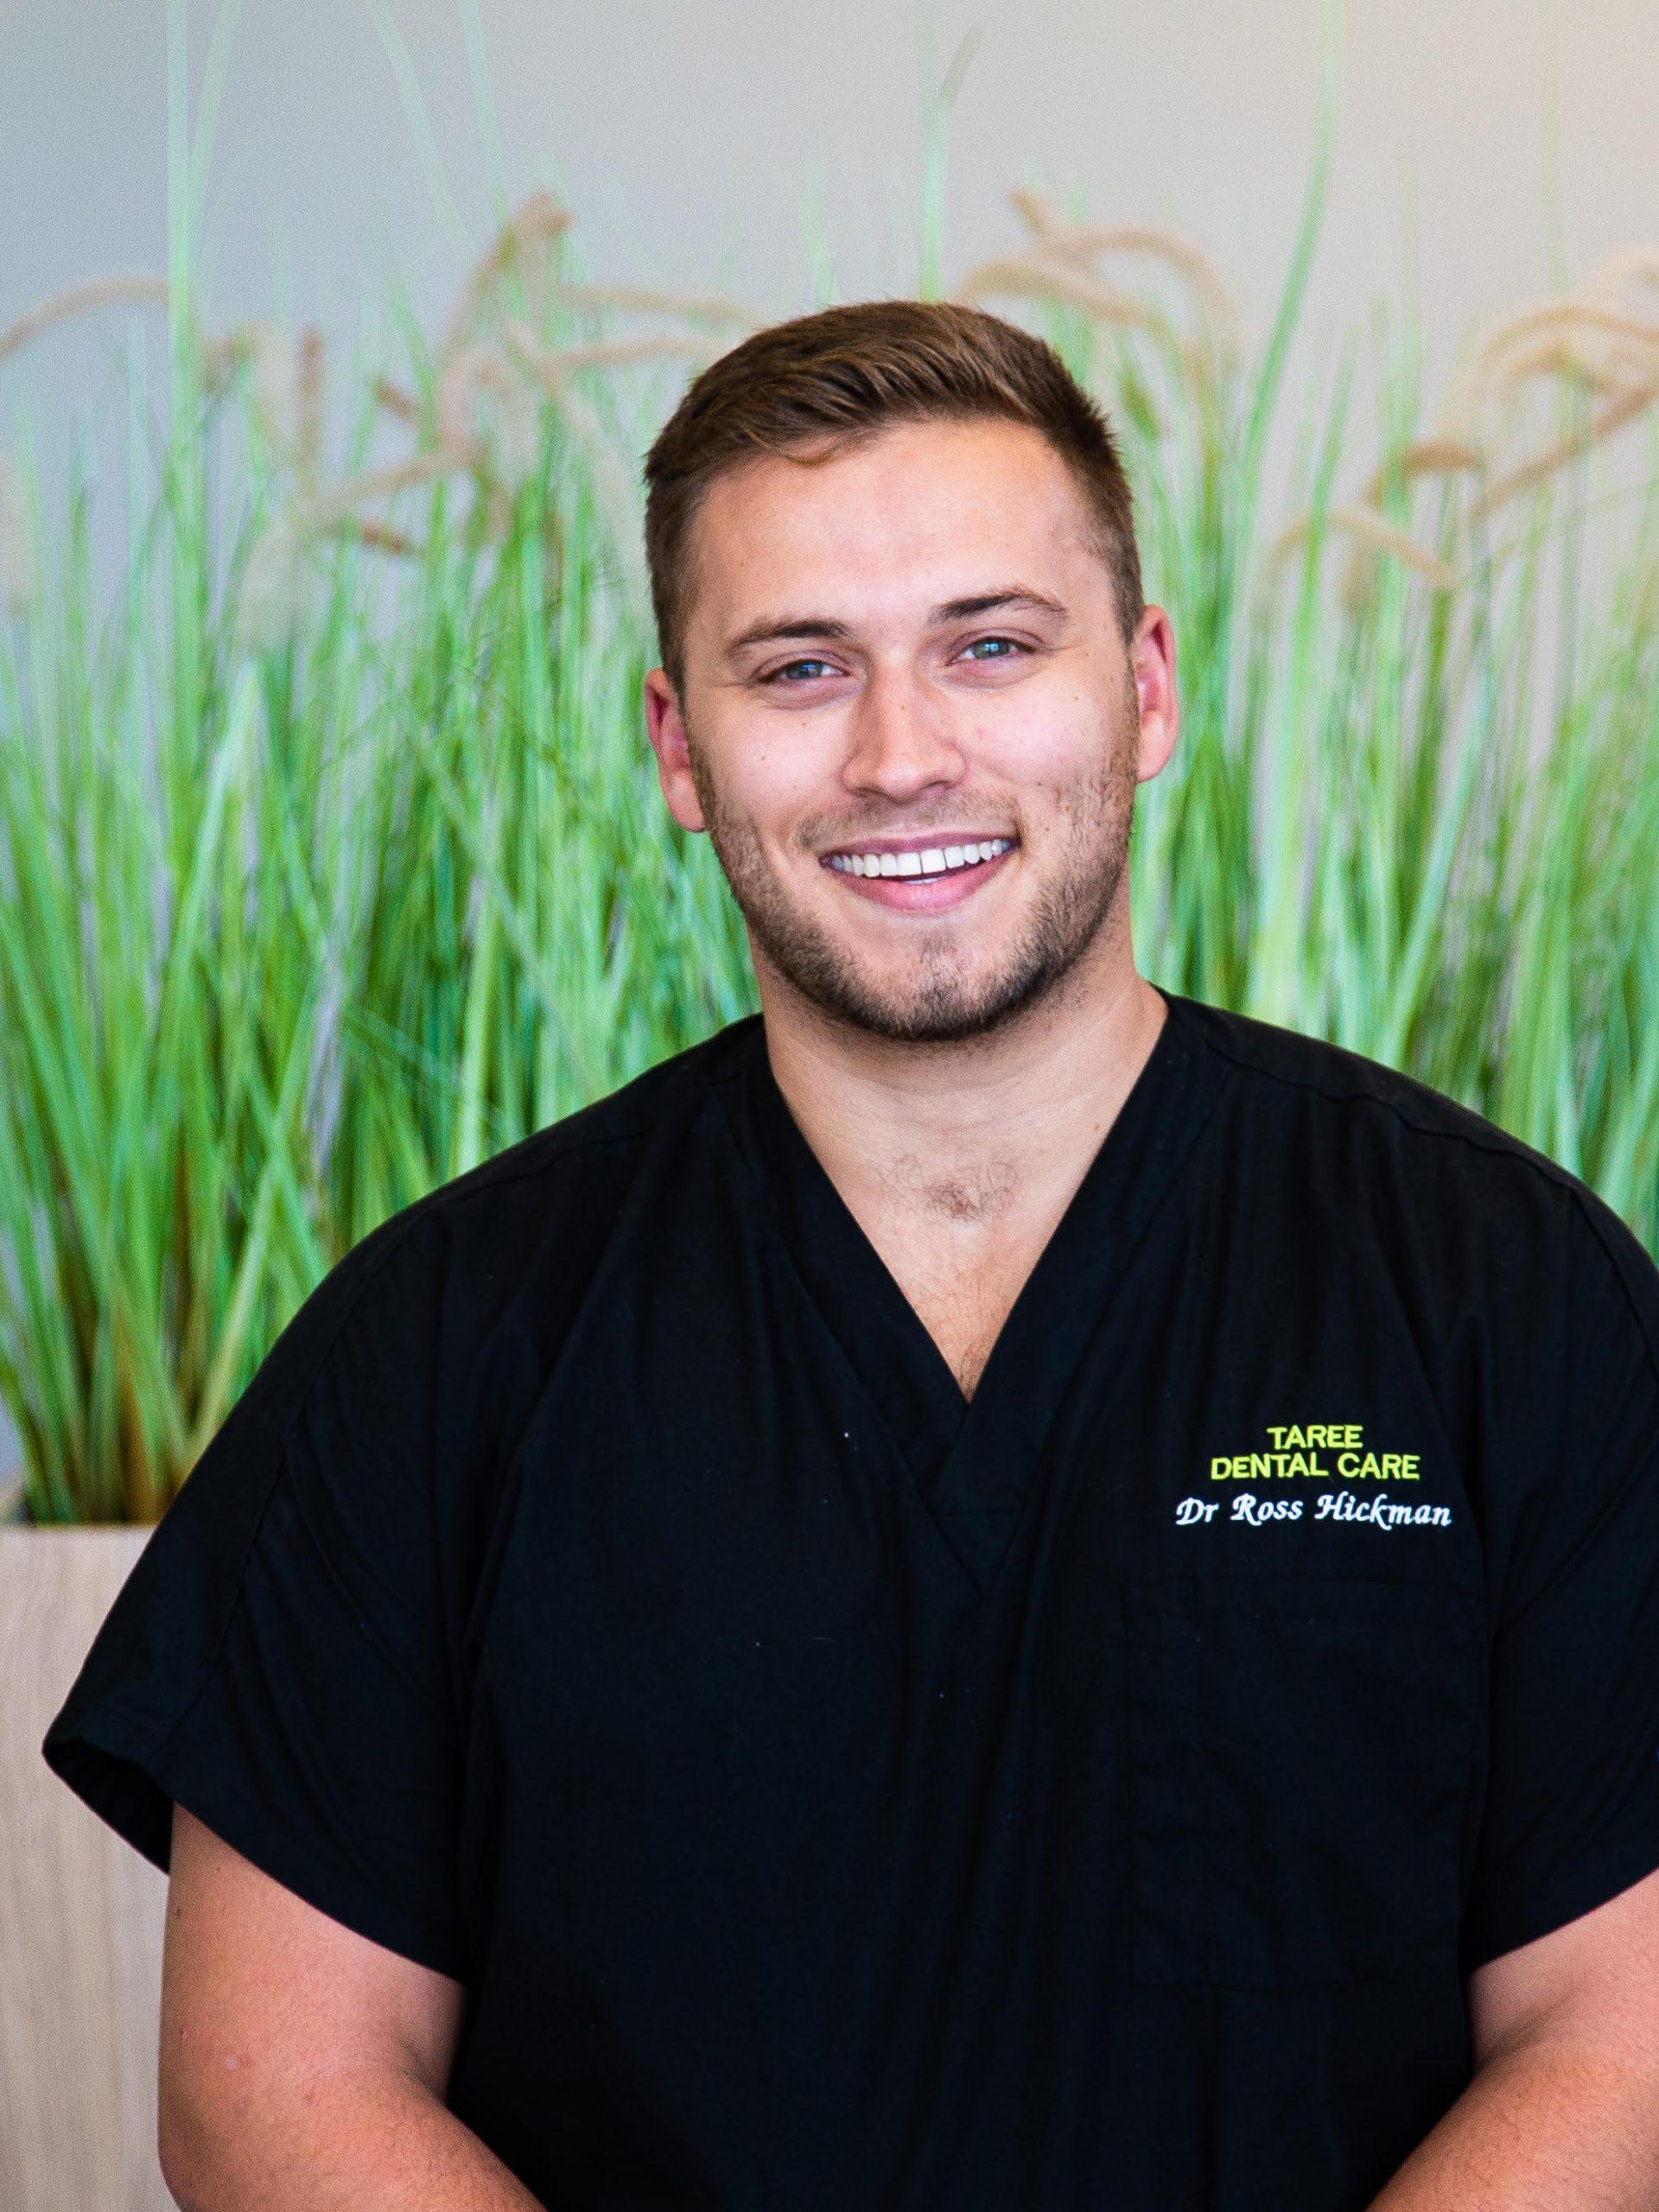 Dr Ross Hickman